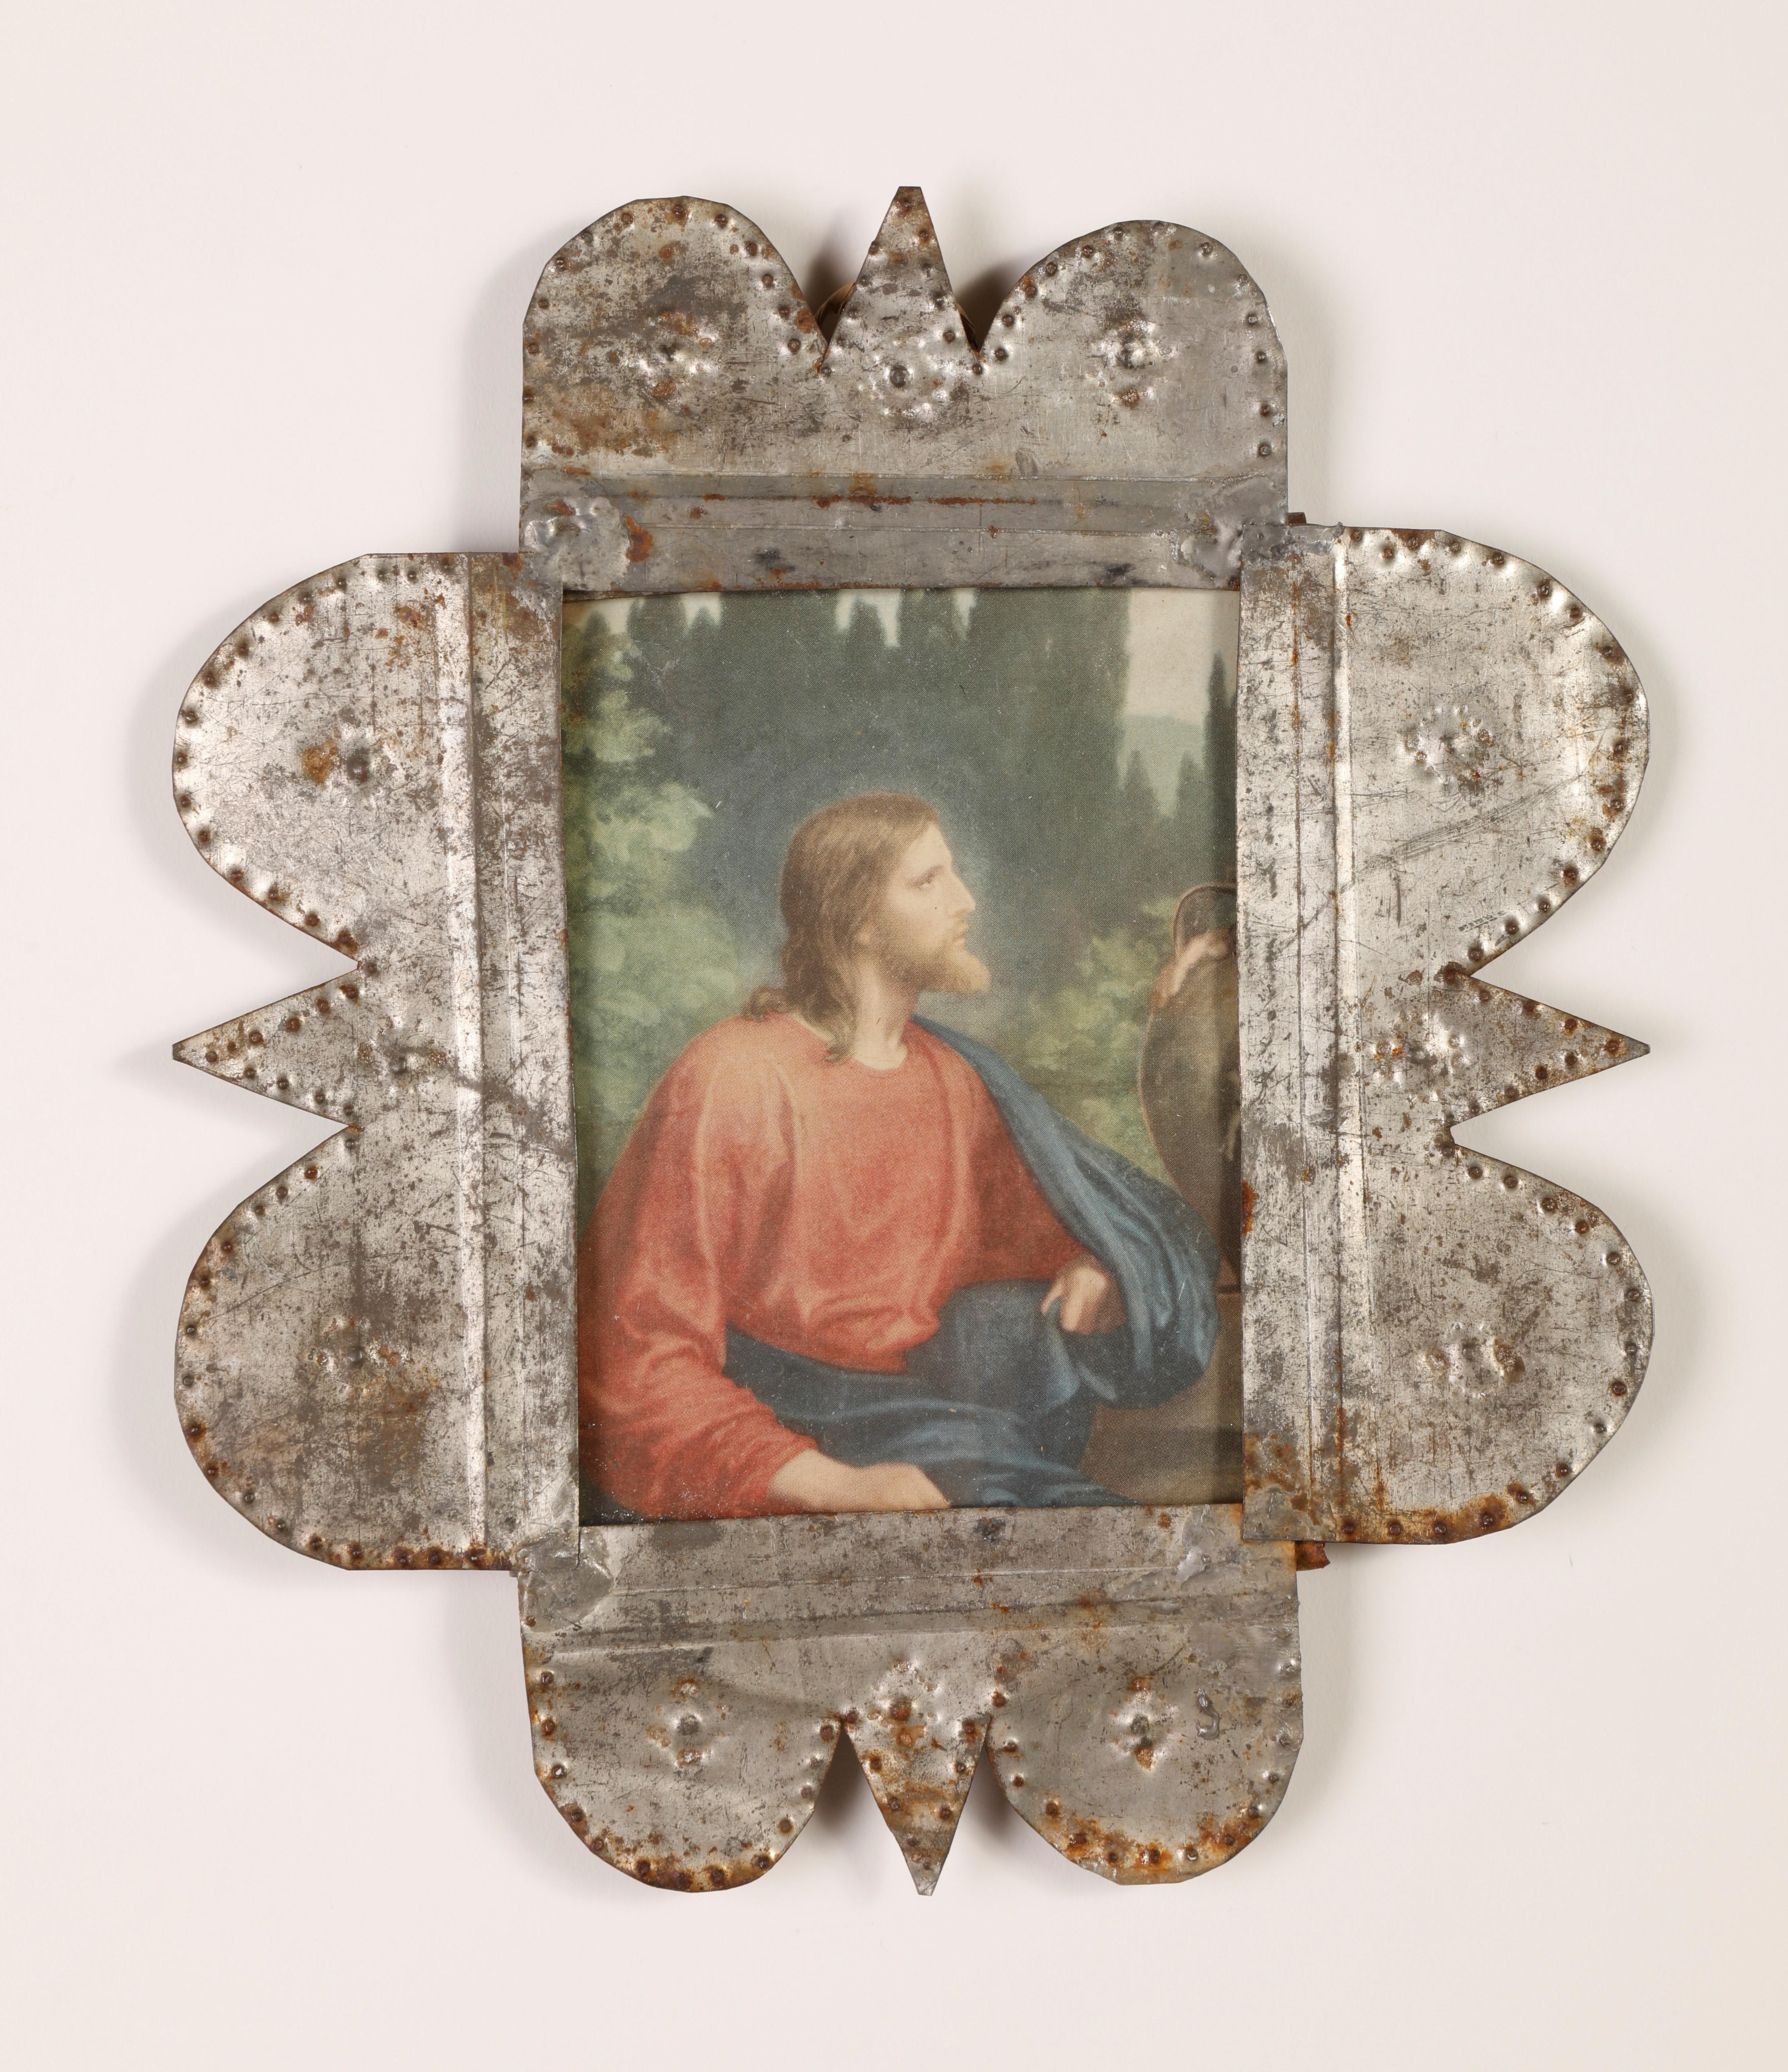 Tin Frame with Devotional Print, ca. 1885